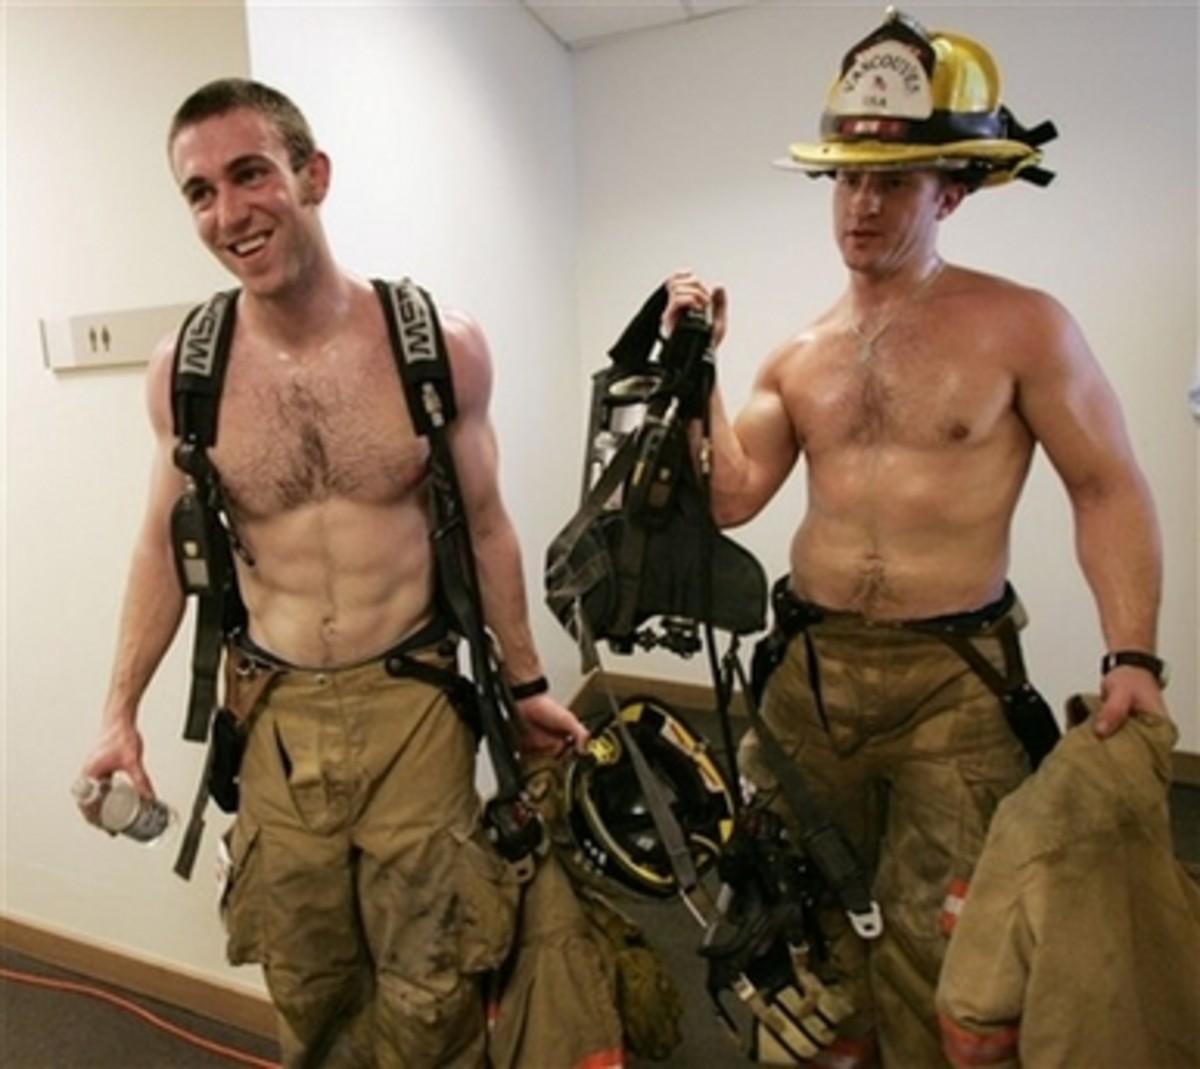 Women's Impression of Men's Fitness